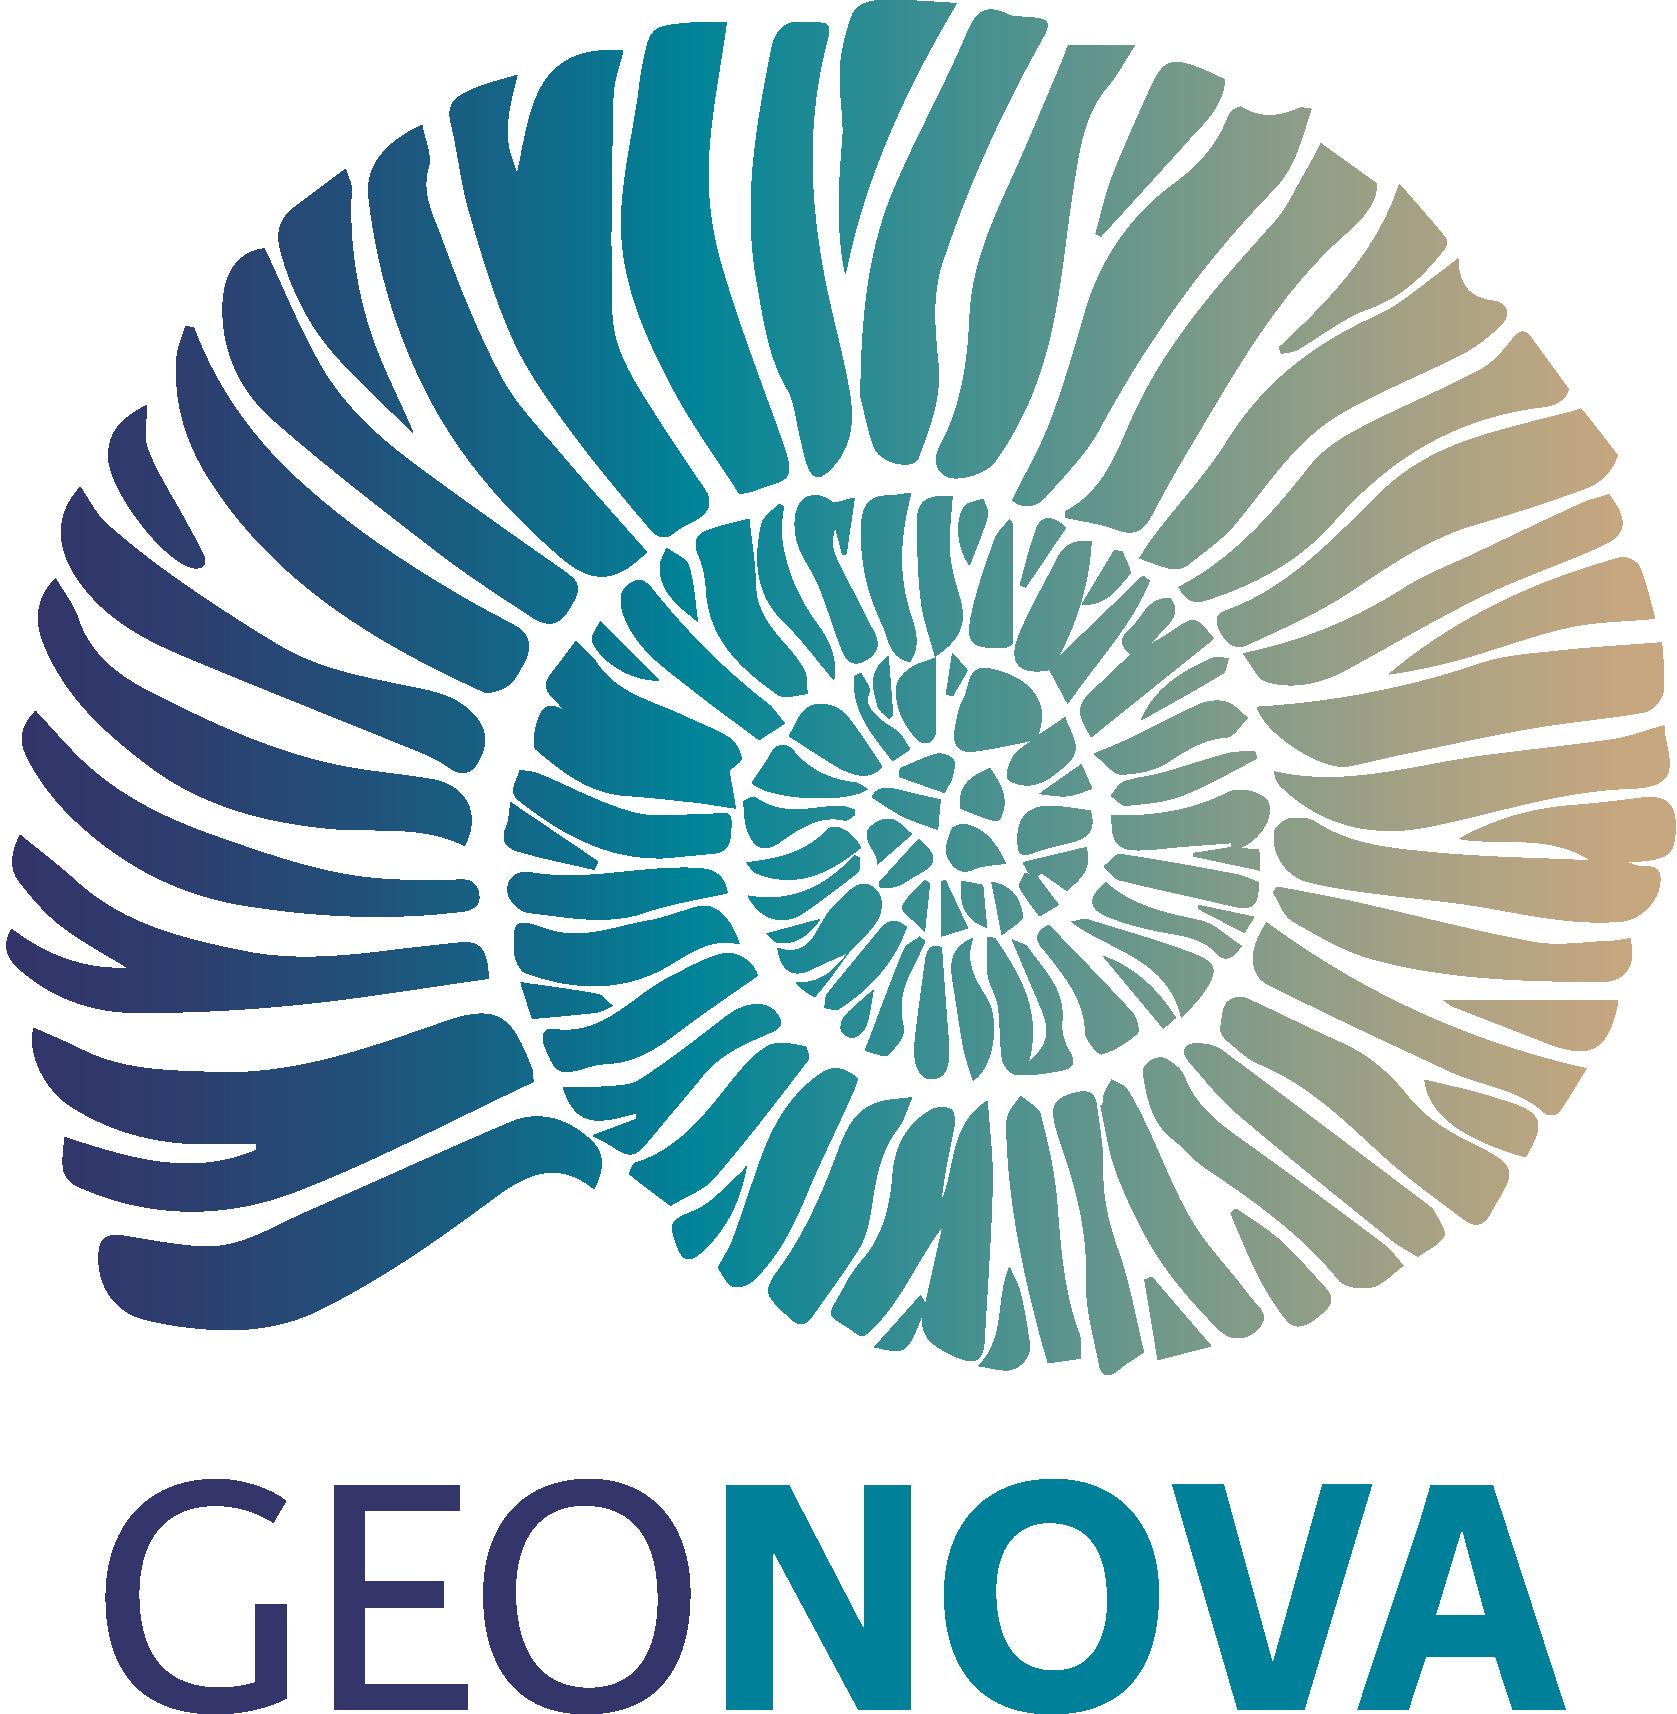 GEONOVA LOGO 2021 color